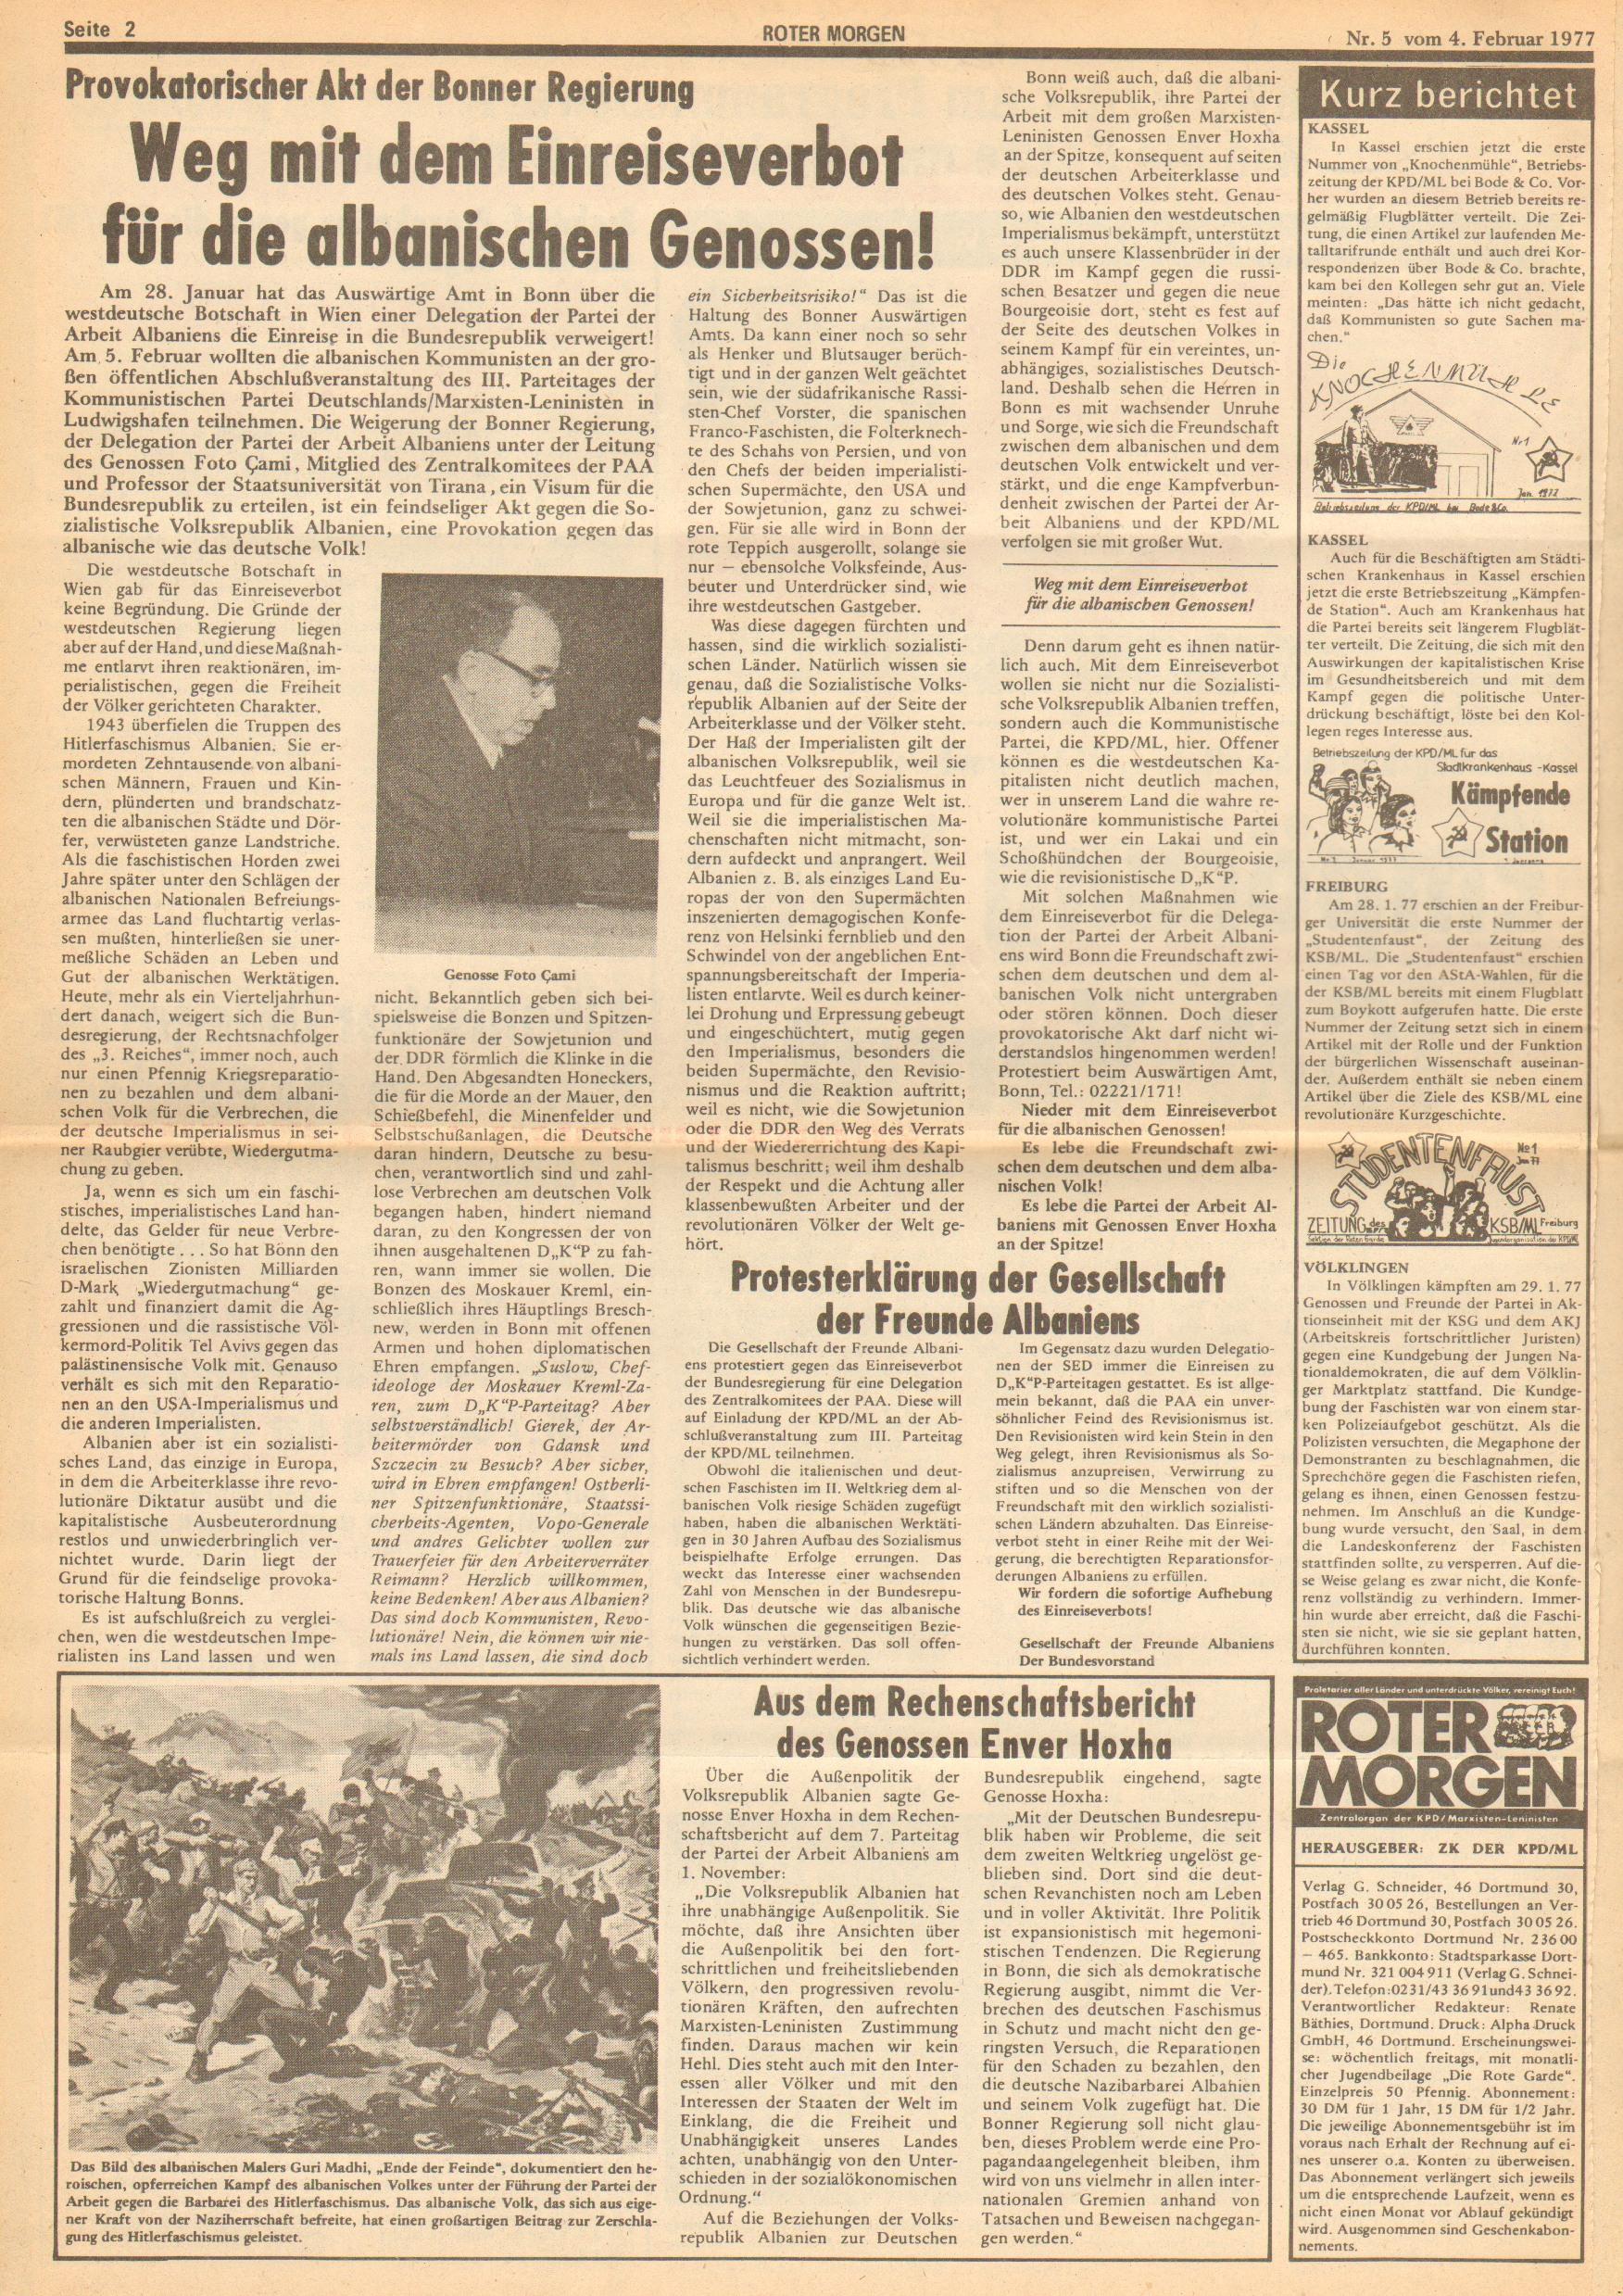 Roter Morgen, 11. Jg., 4. Februar 1977, Nr. 5, Seite 2